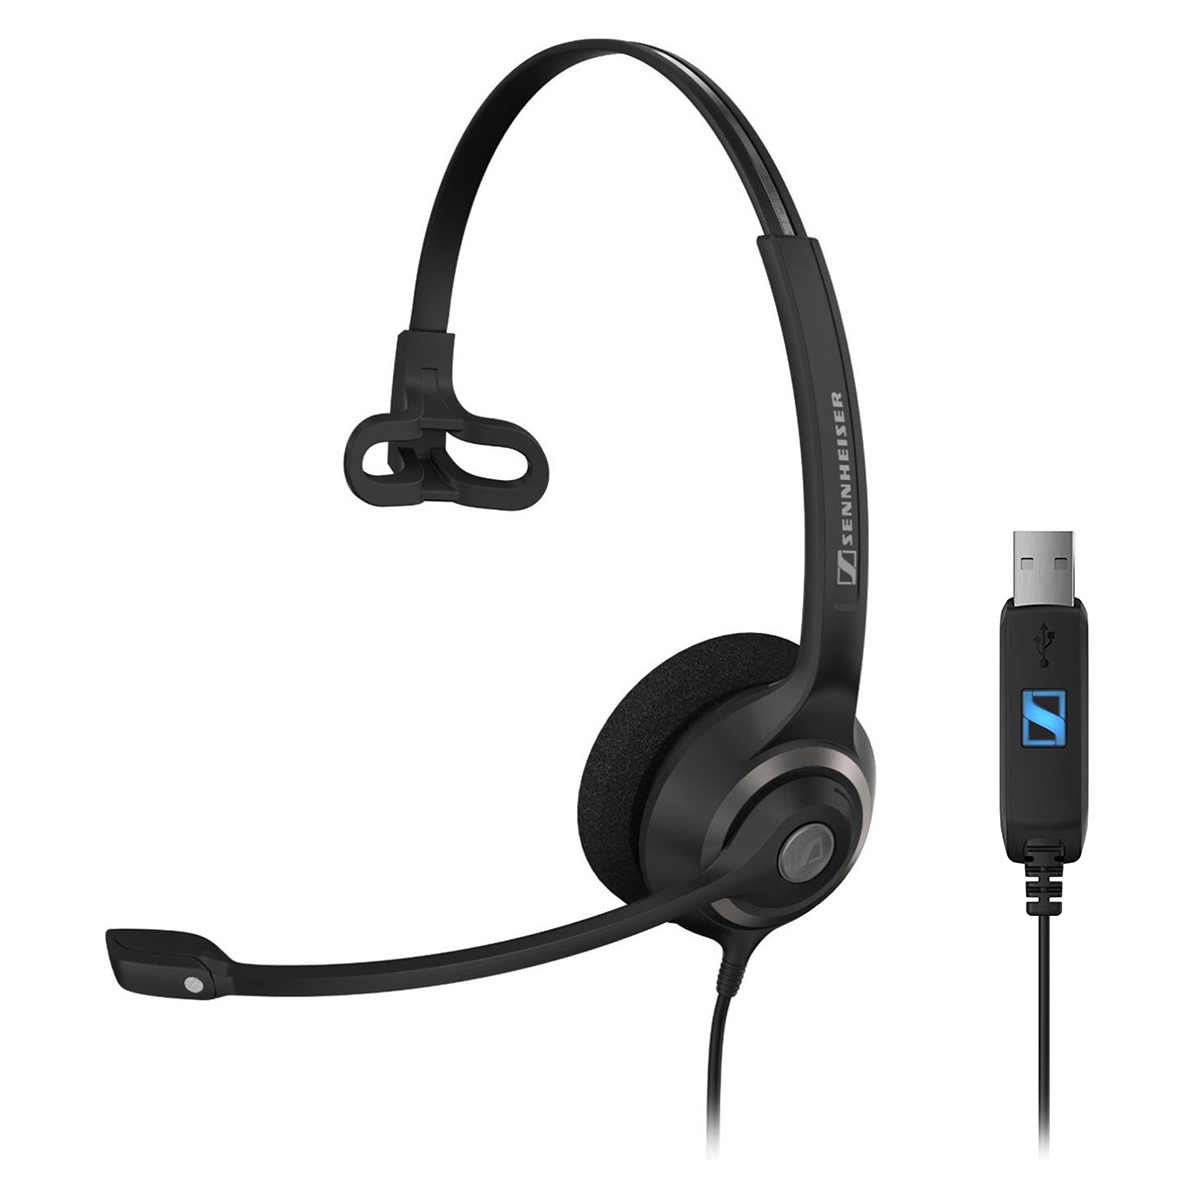 EPOS Sennheiser SC230 USB Monaural Headset